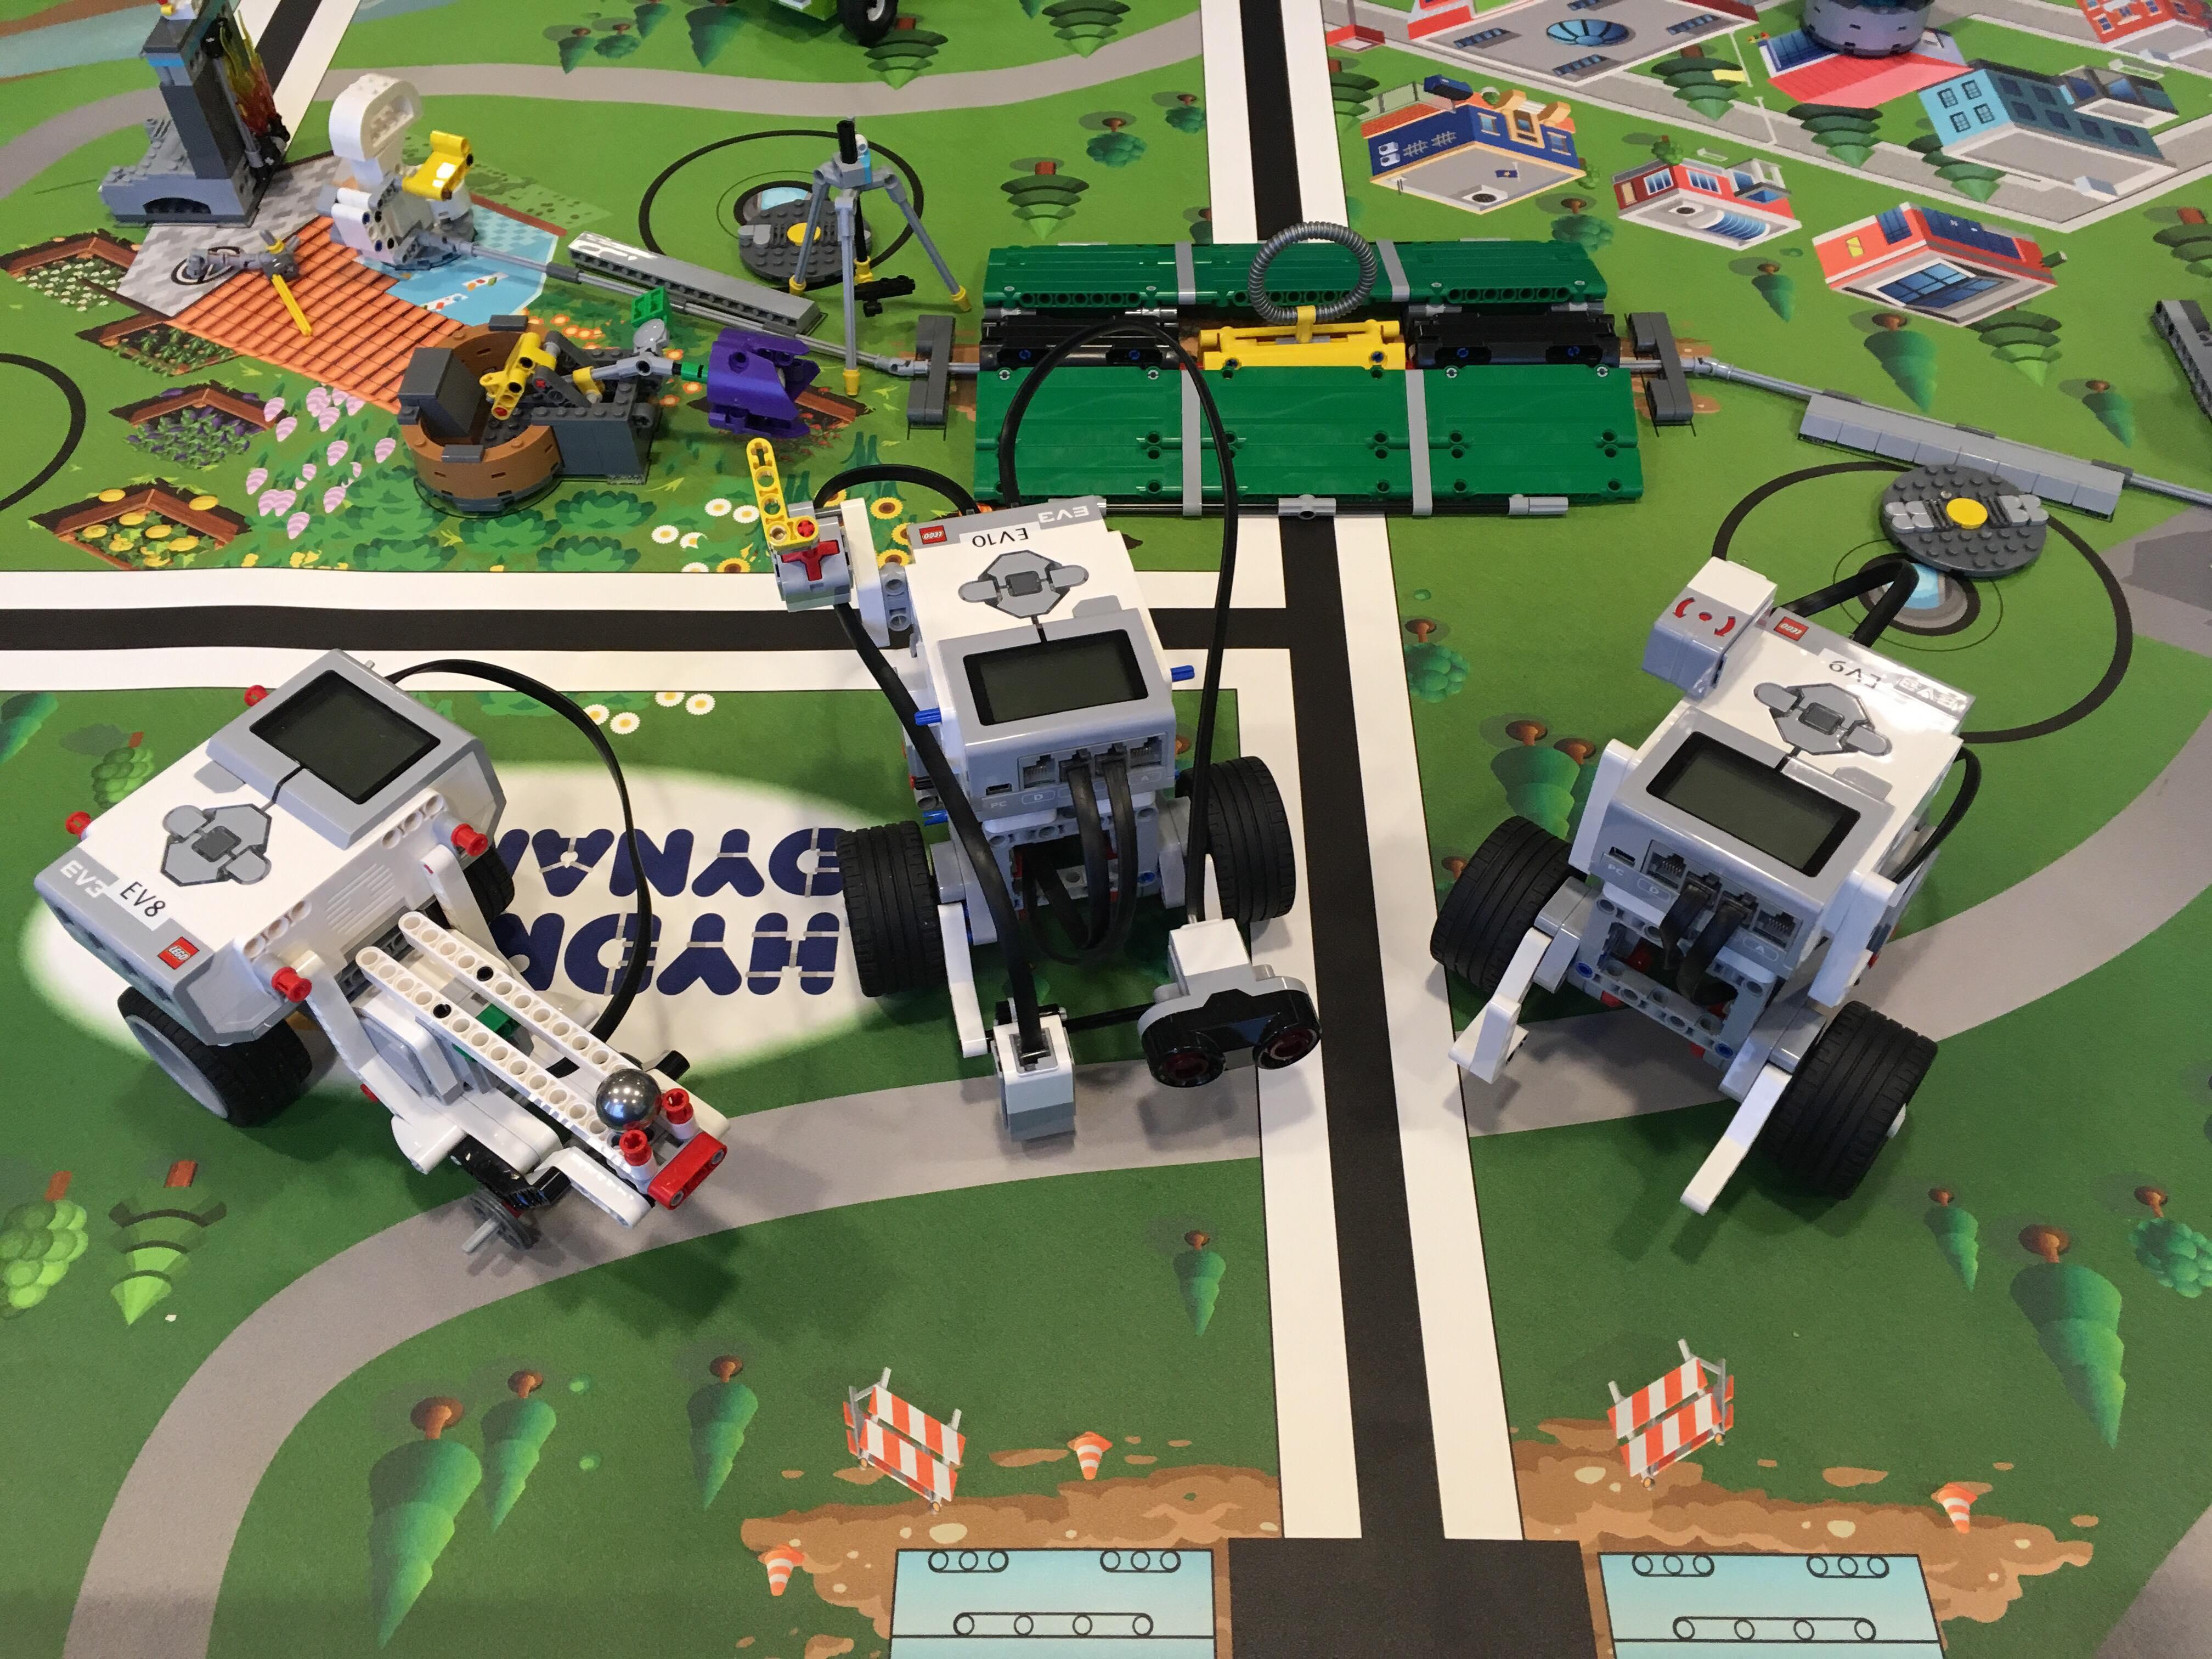 Lego-robotar står på legobord.